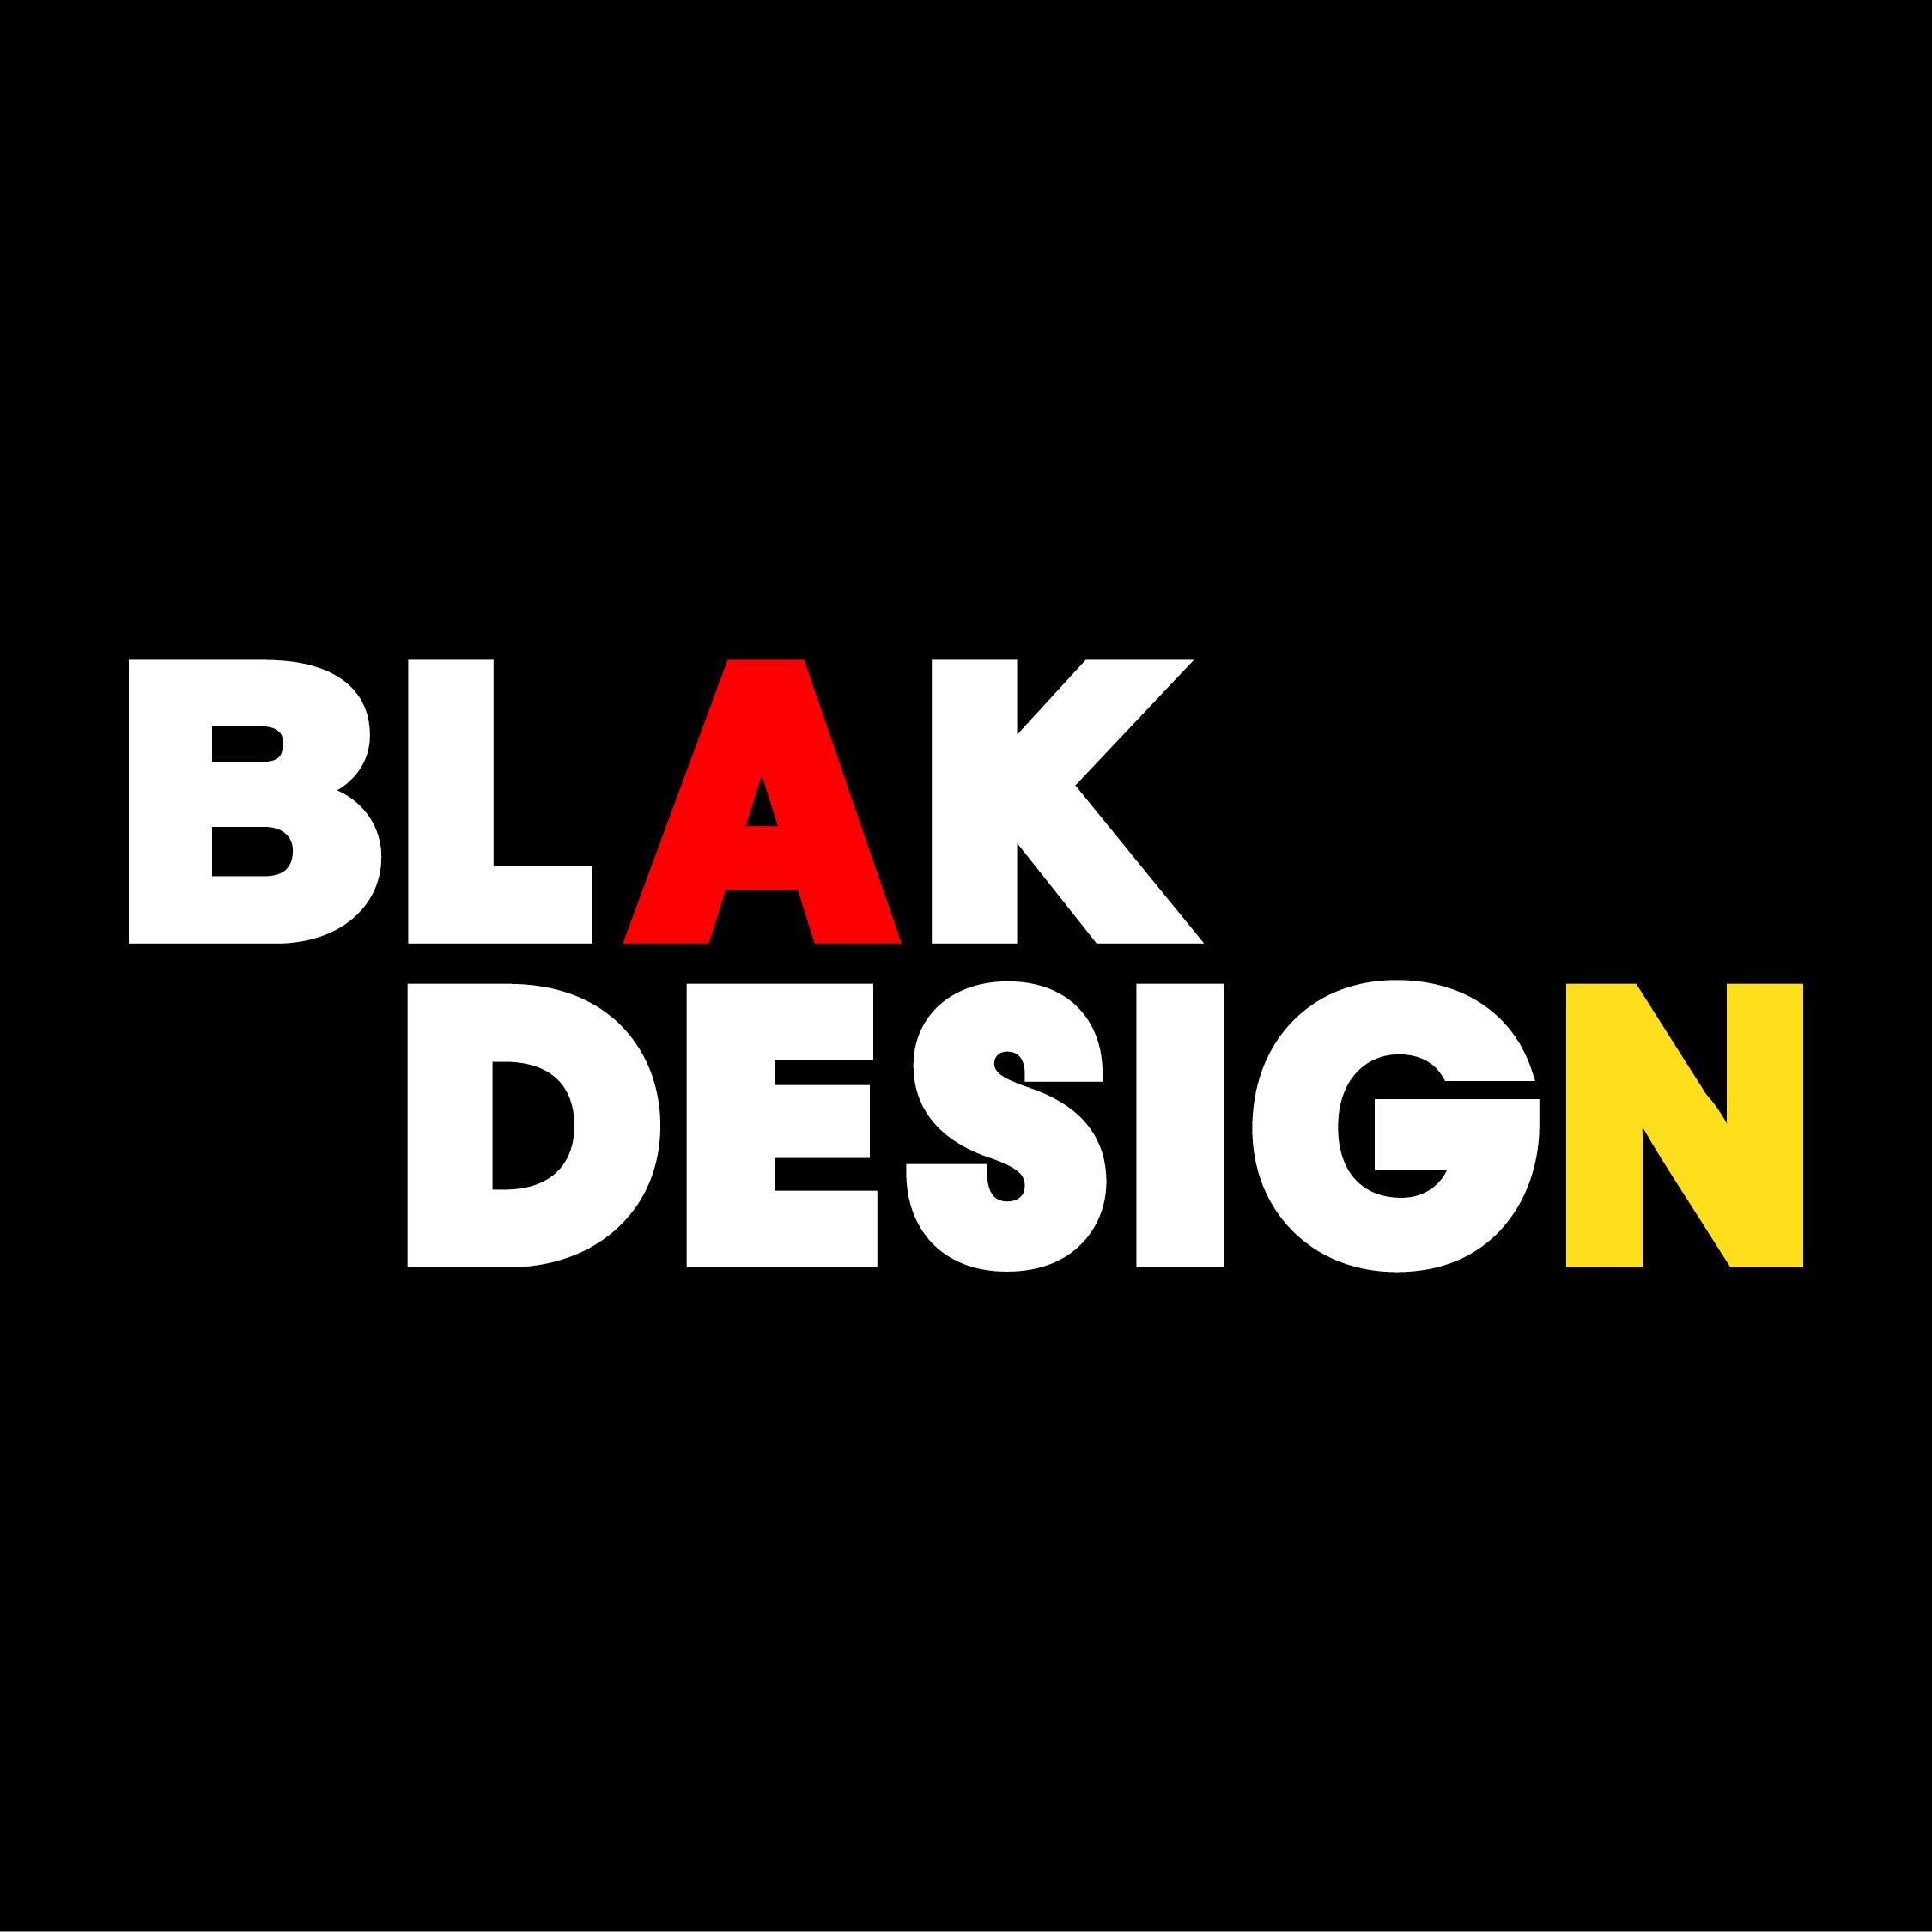 Blak Design